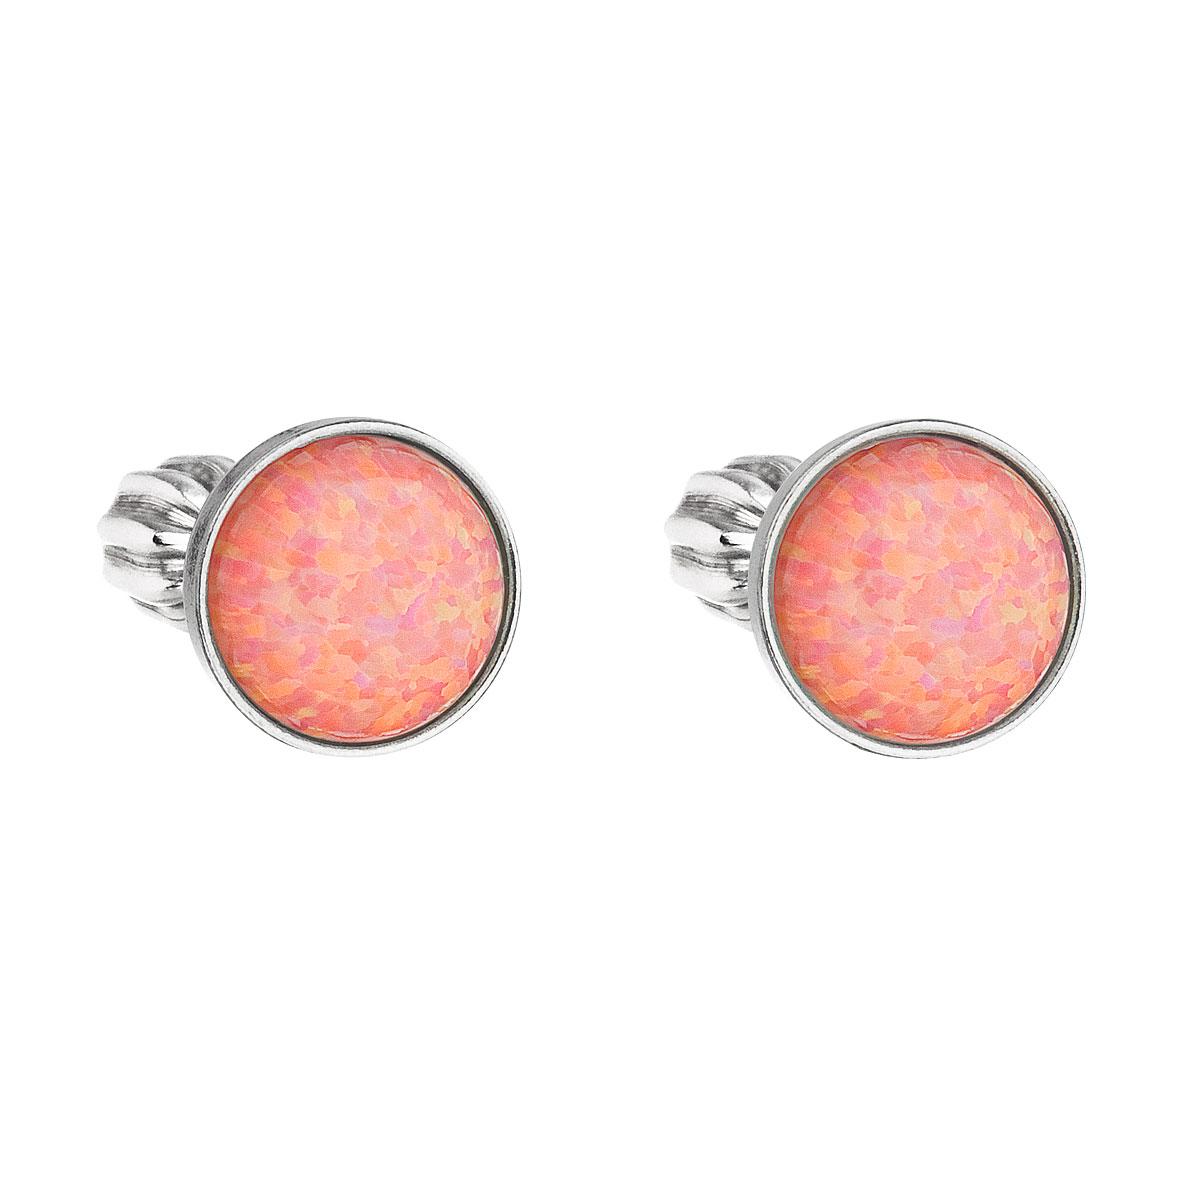 Strieborné náušnice perličky so syntetickým opálom oranžové okrúhle 11001.3